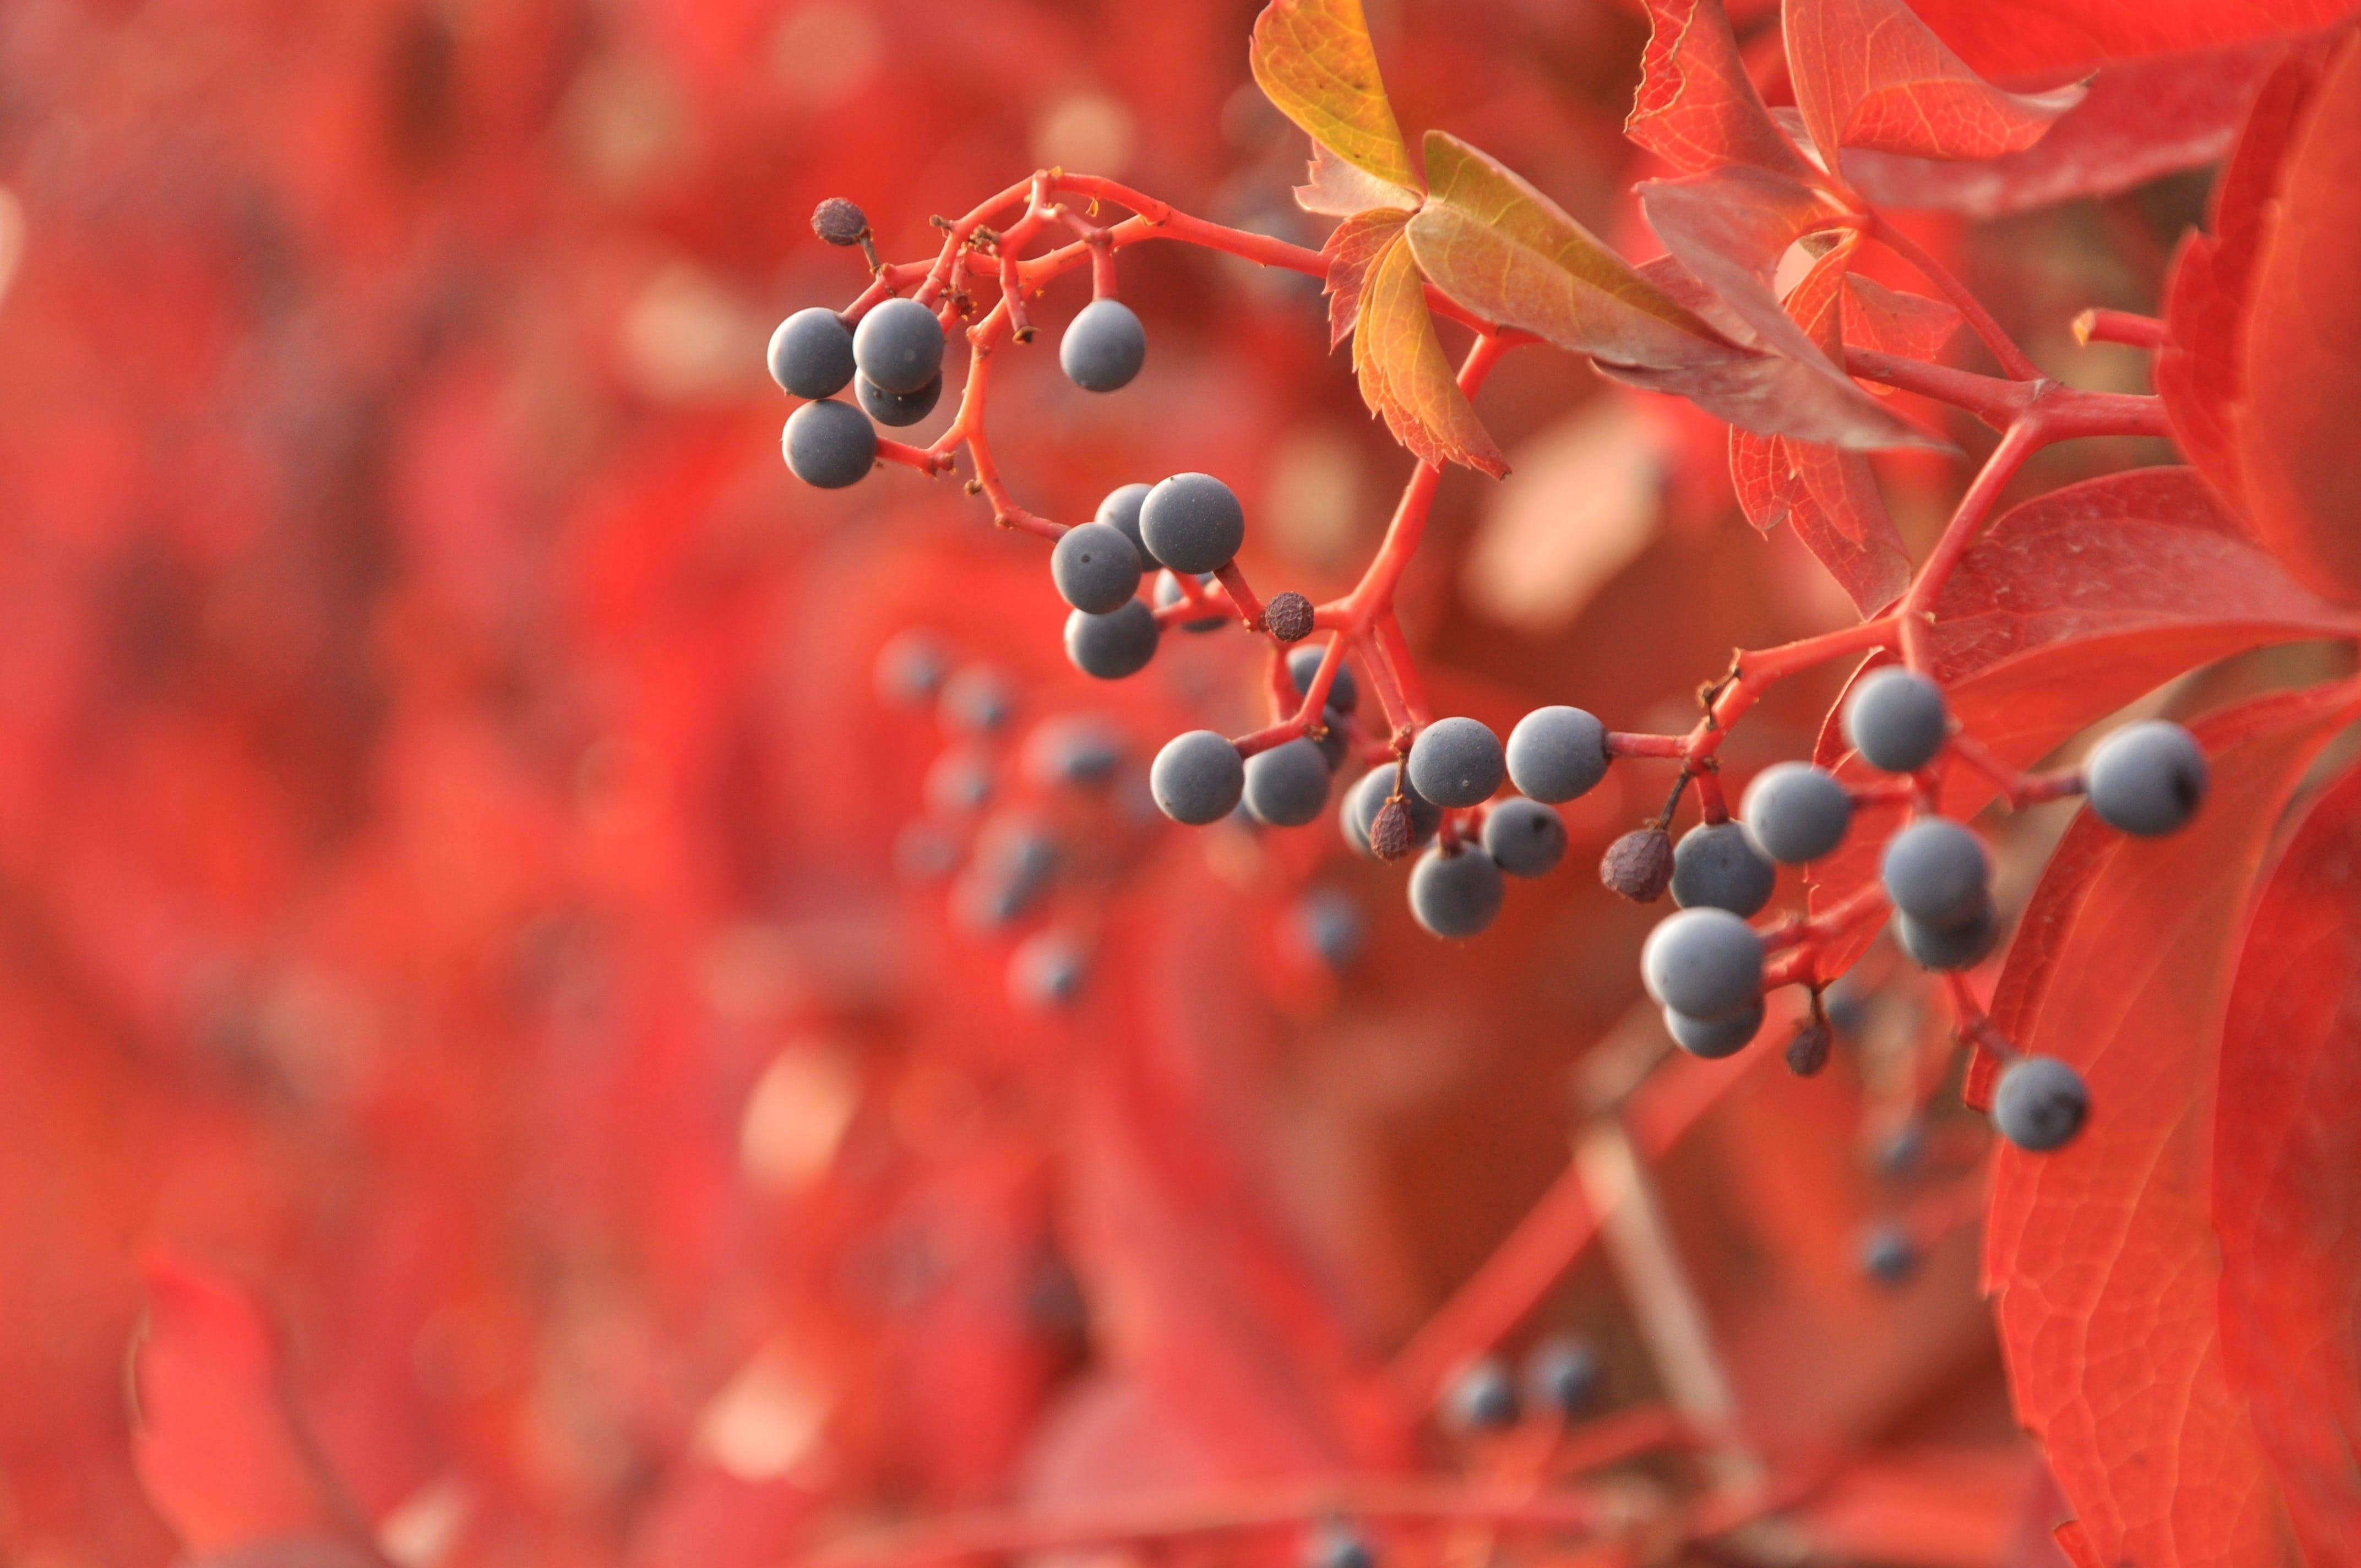 autumn, berries, blur